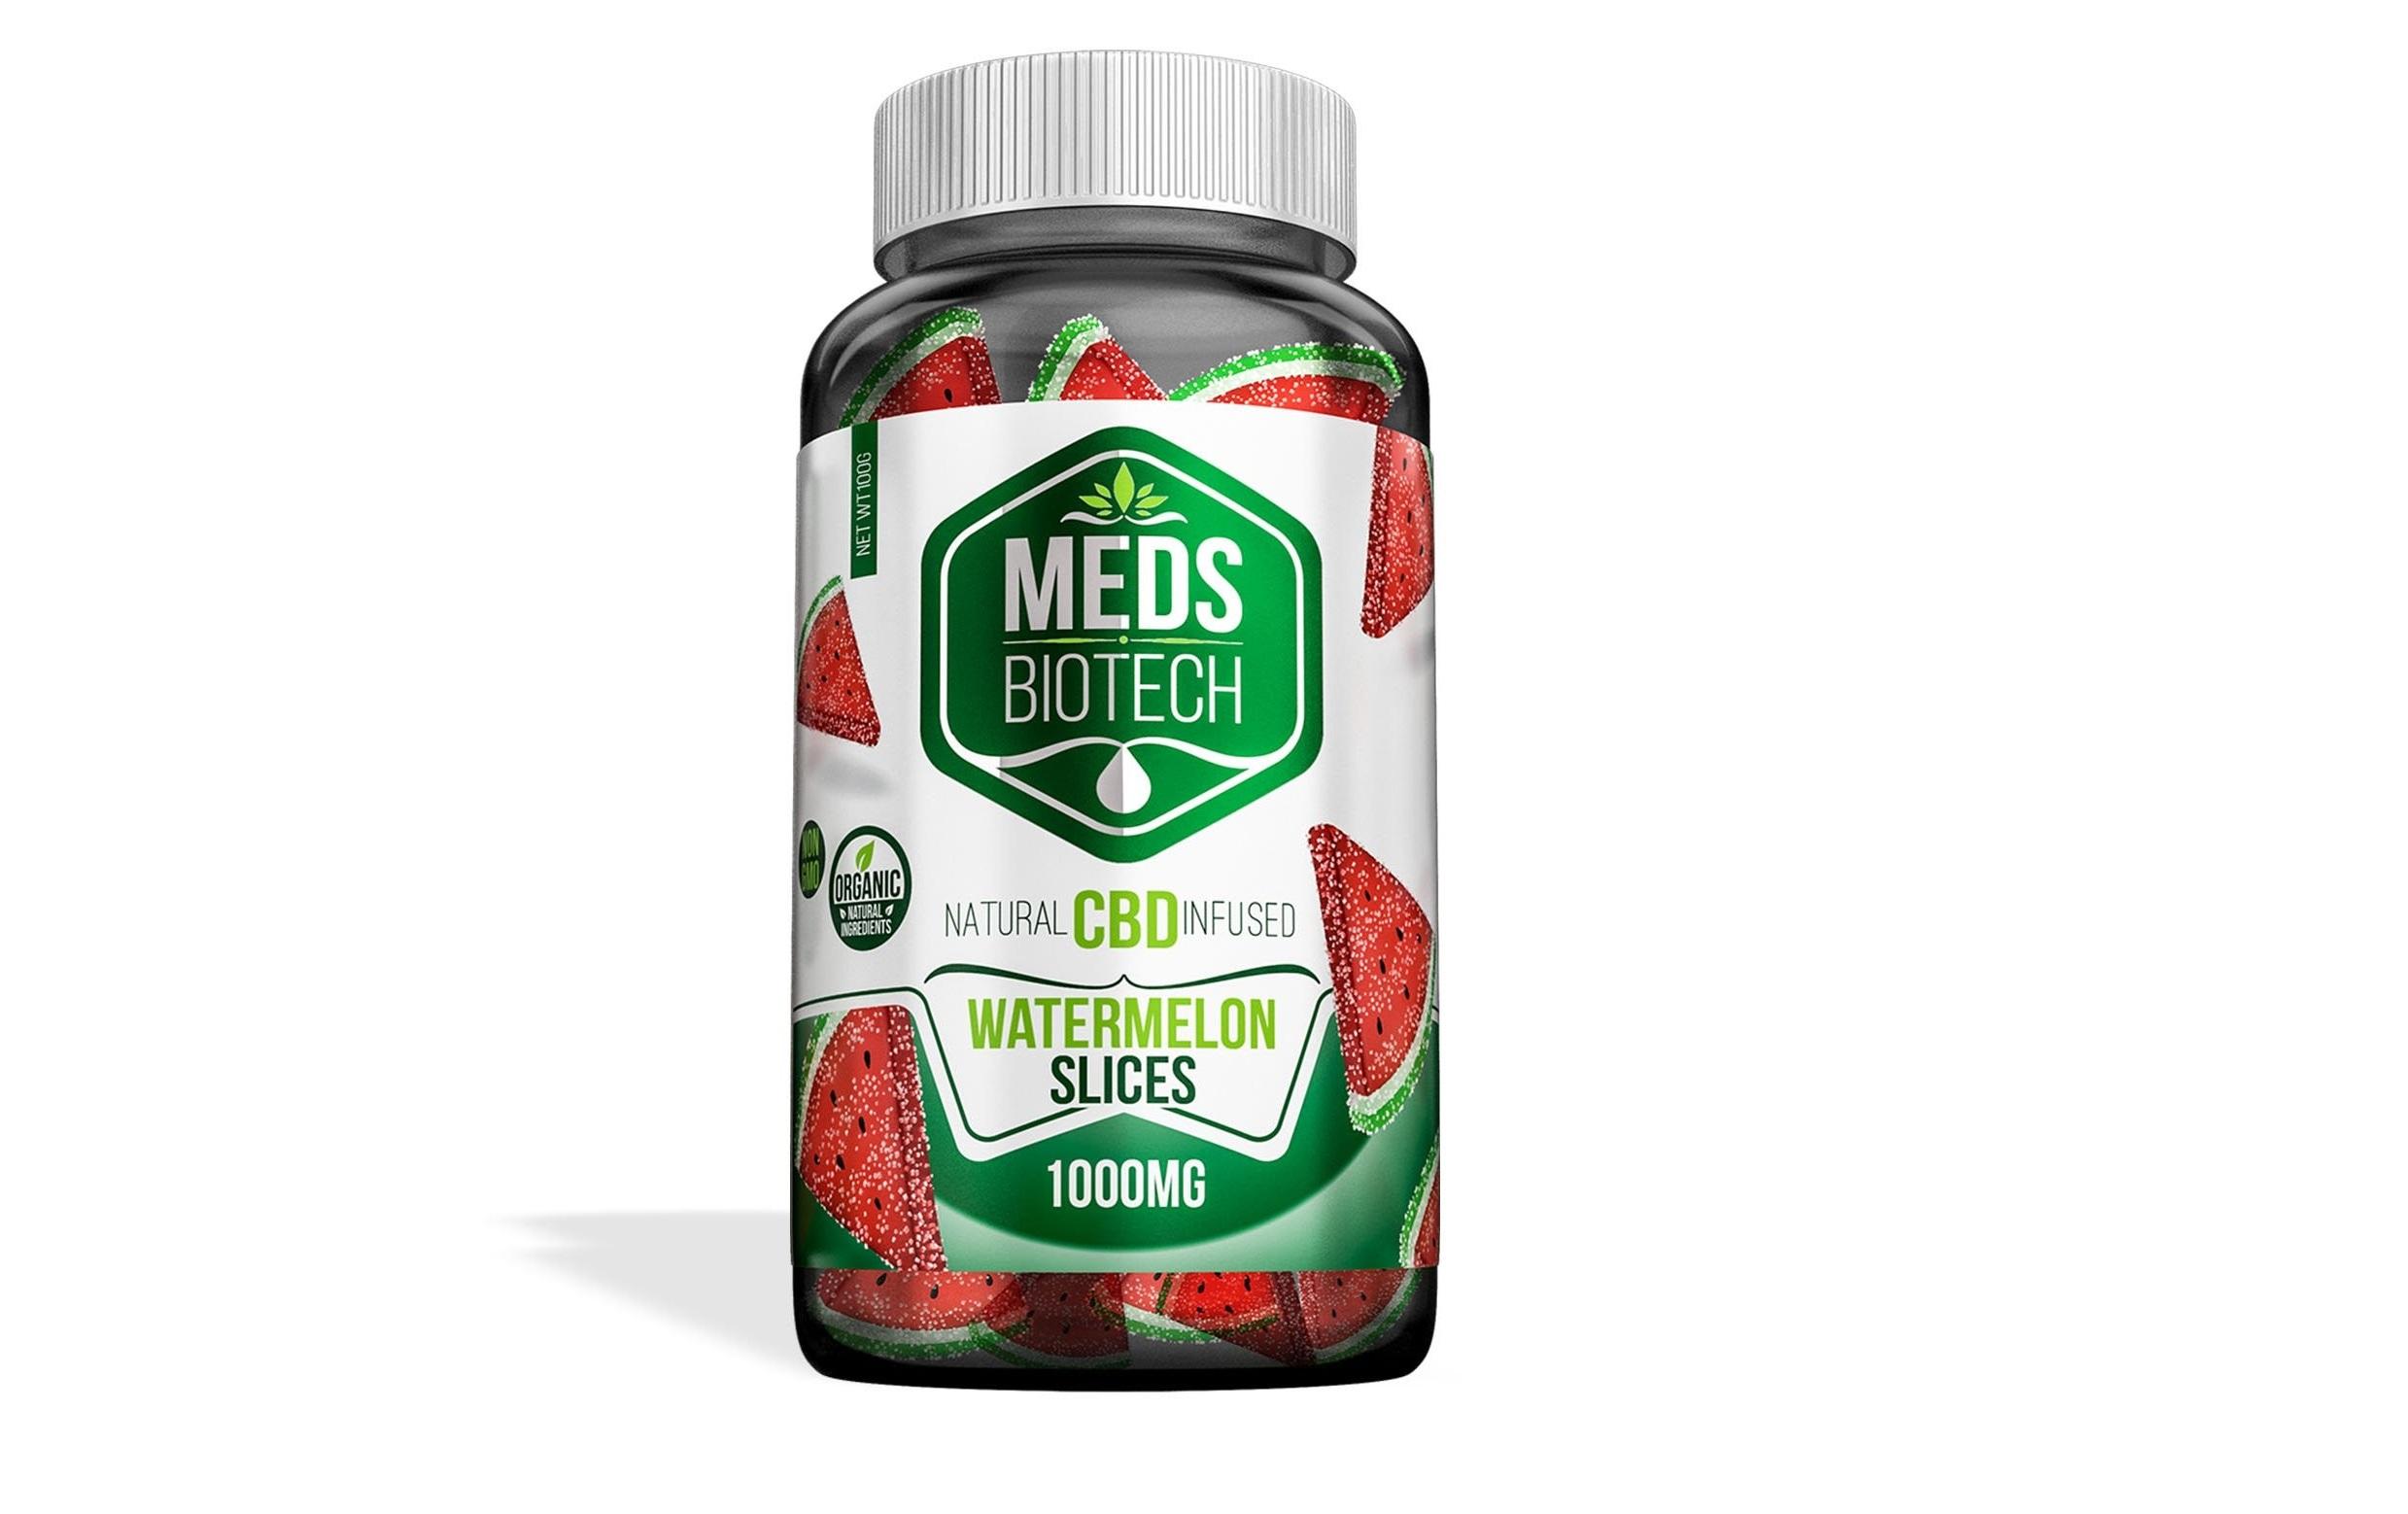 Meds Biotech Gummies - CBD Infused Watermelon Slices